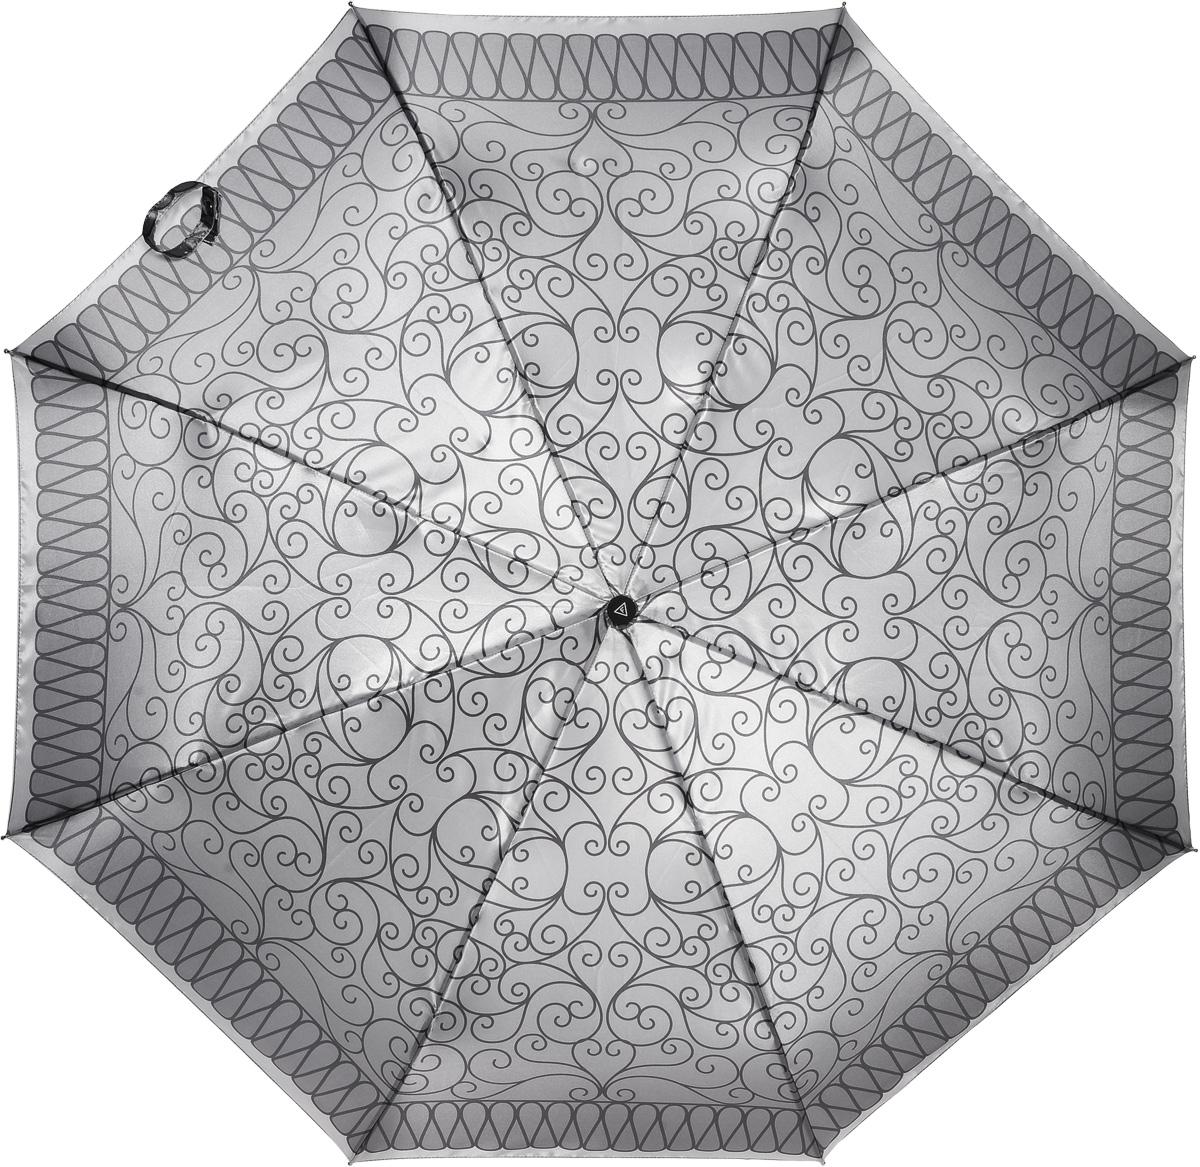 Зонт женский Fabretti, автомат, 3 сложения. L-16104-8L-16104-8Зонт женский Fabretti, облегченный суперавтомат, 3 сложения